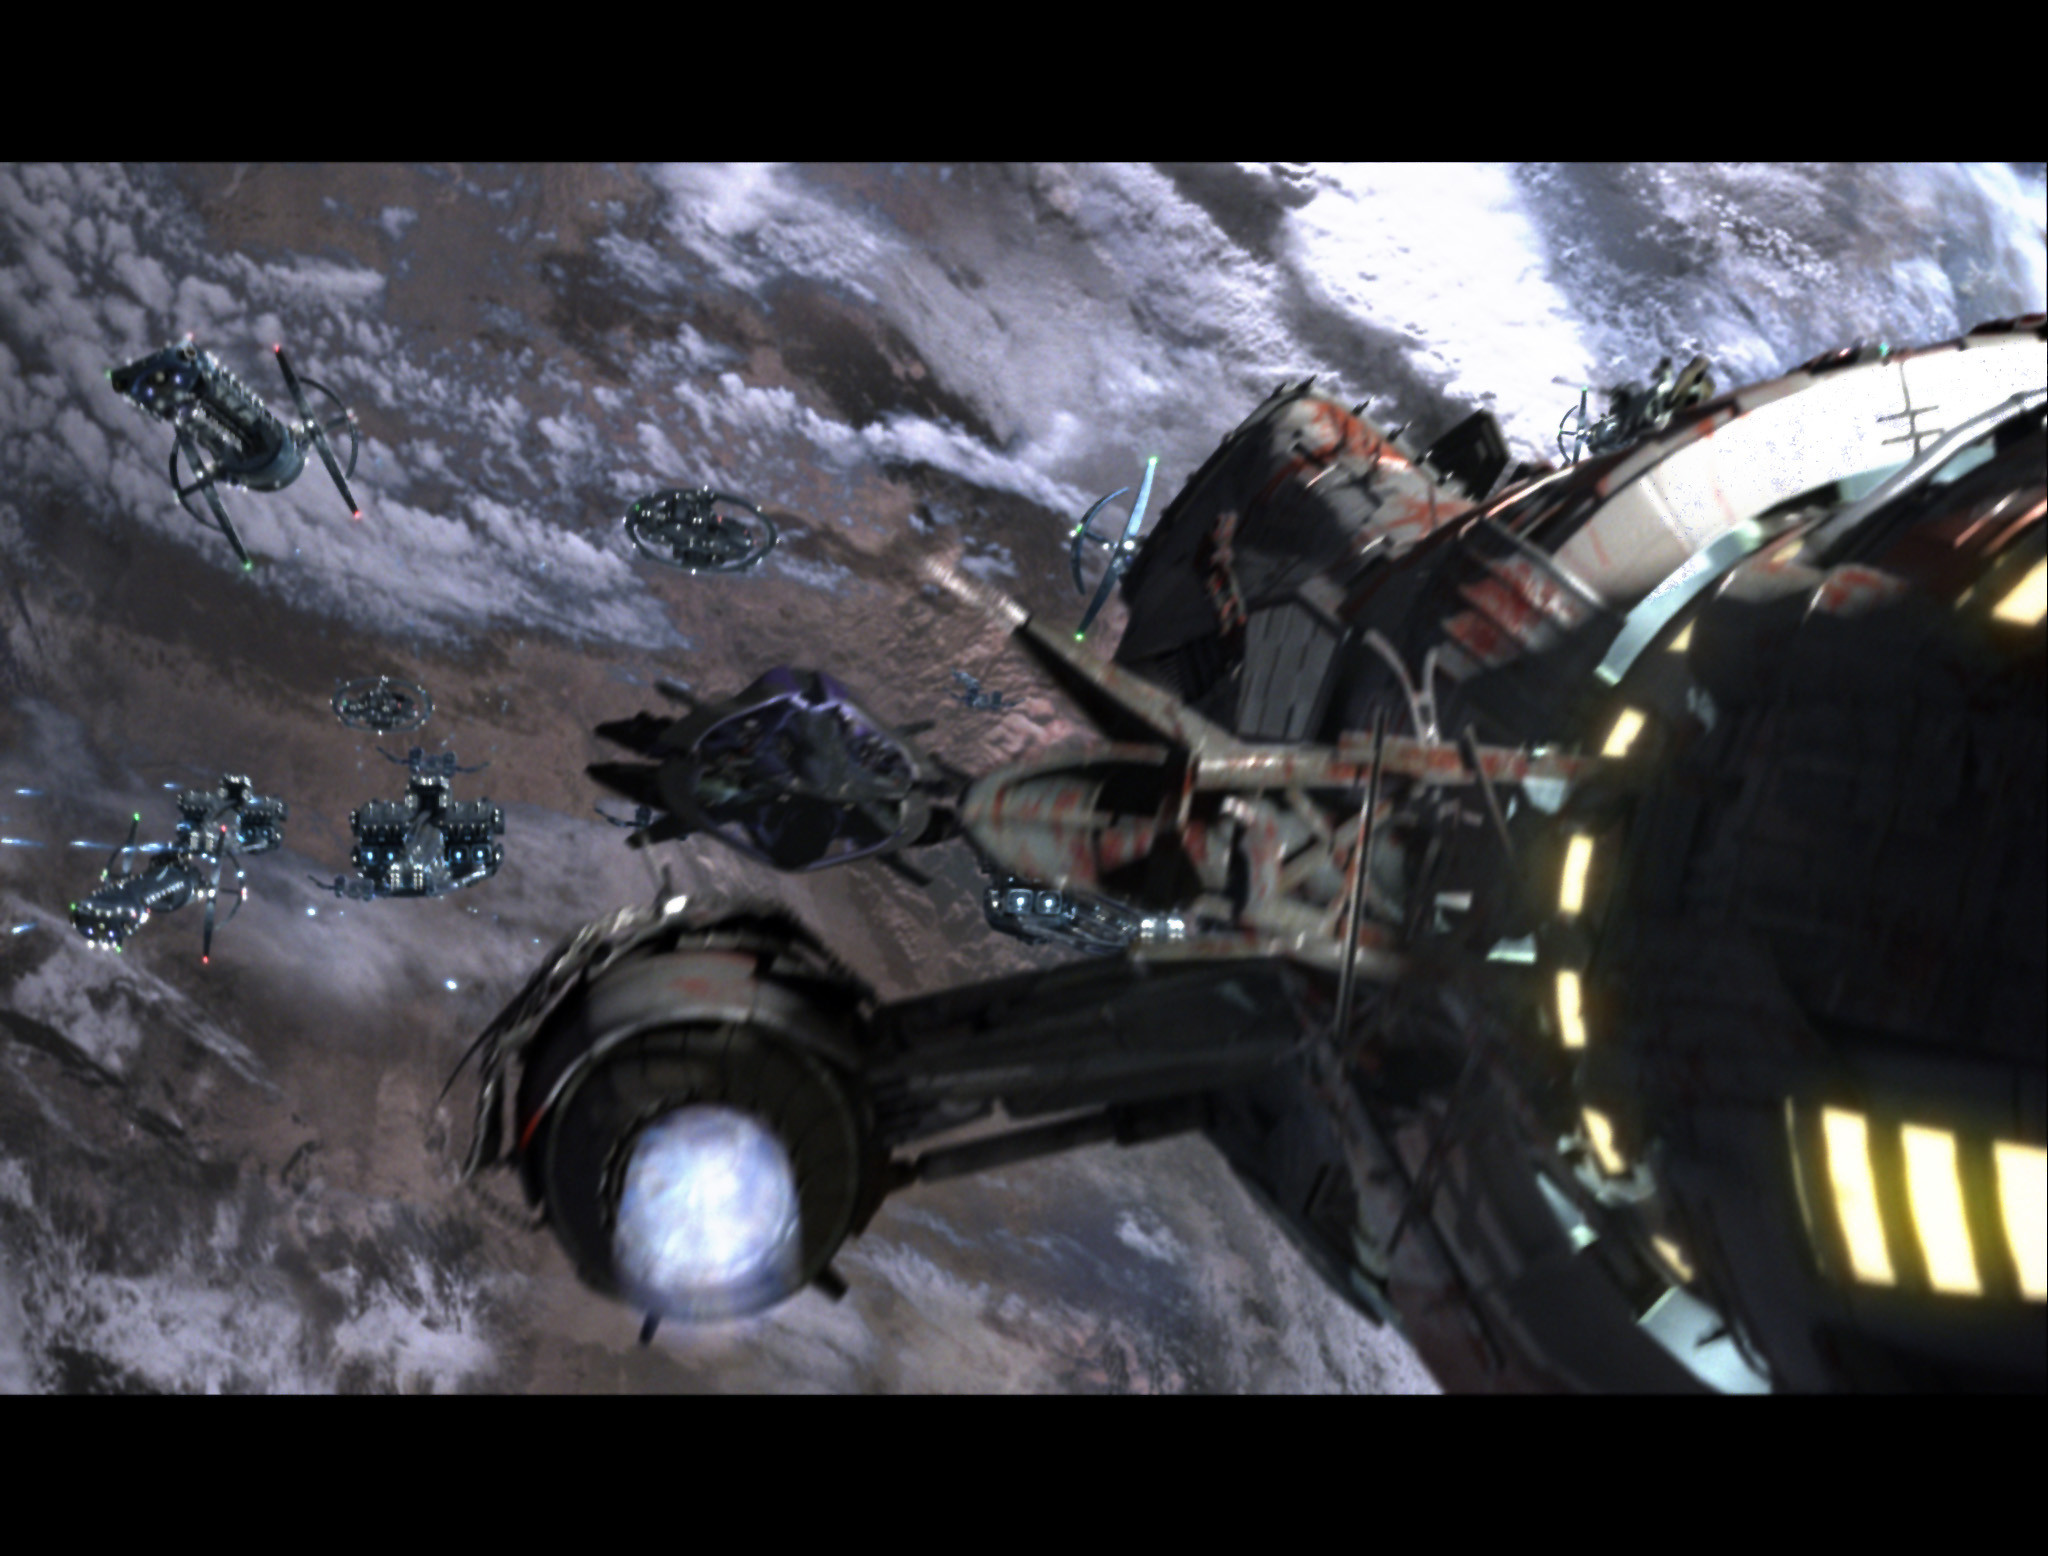 Serenity space battle by Muldoon85 on deviantART